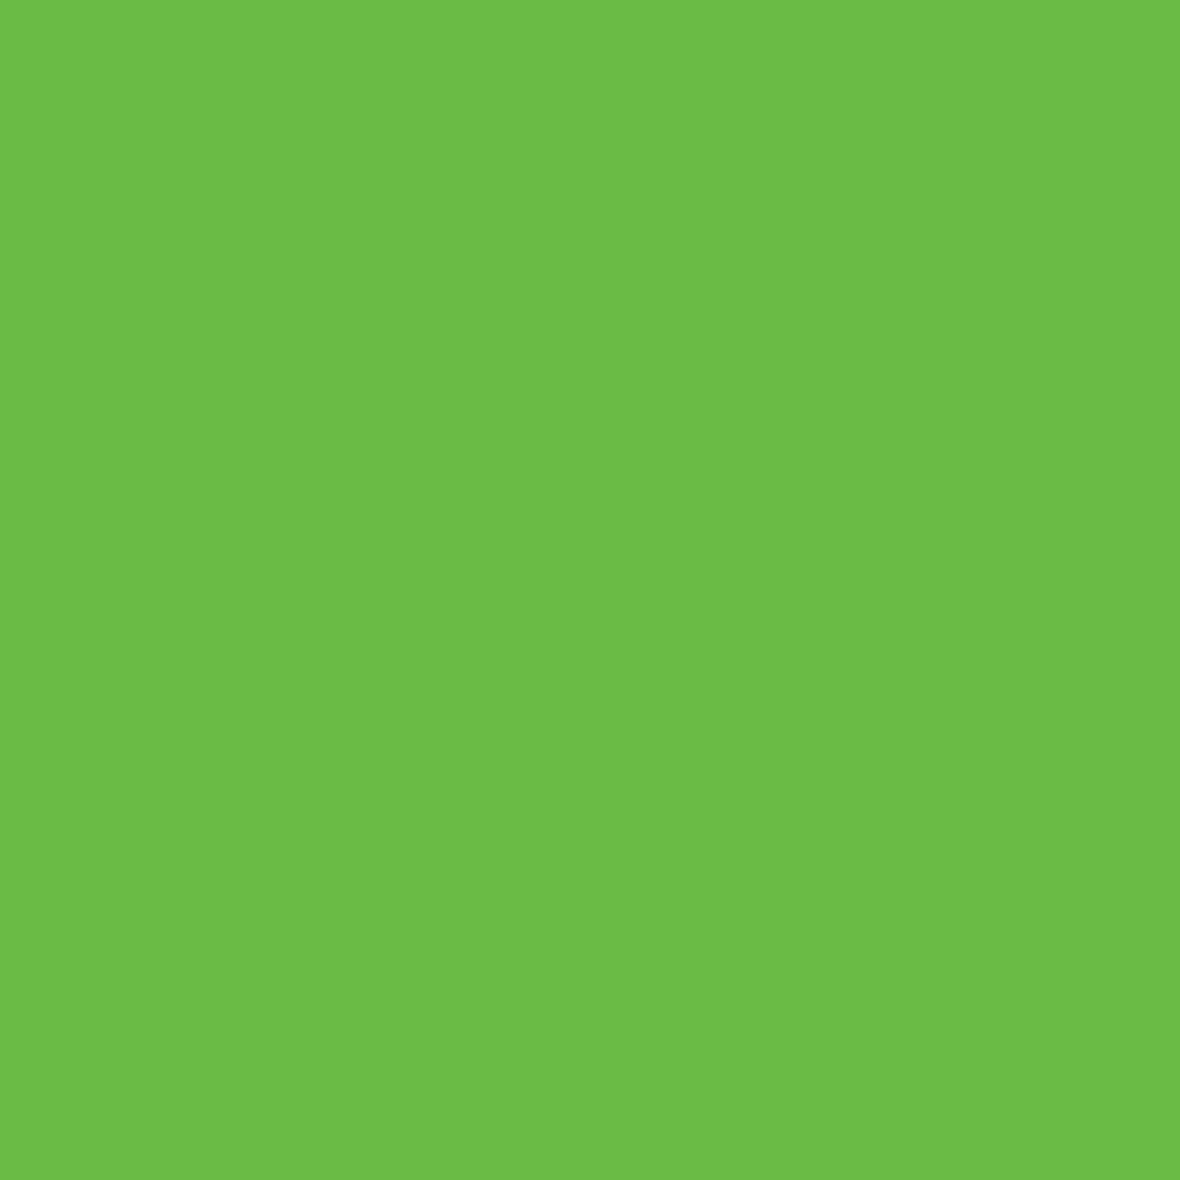 farbmuster hellgruen stiftung contact